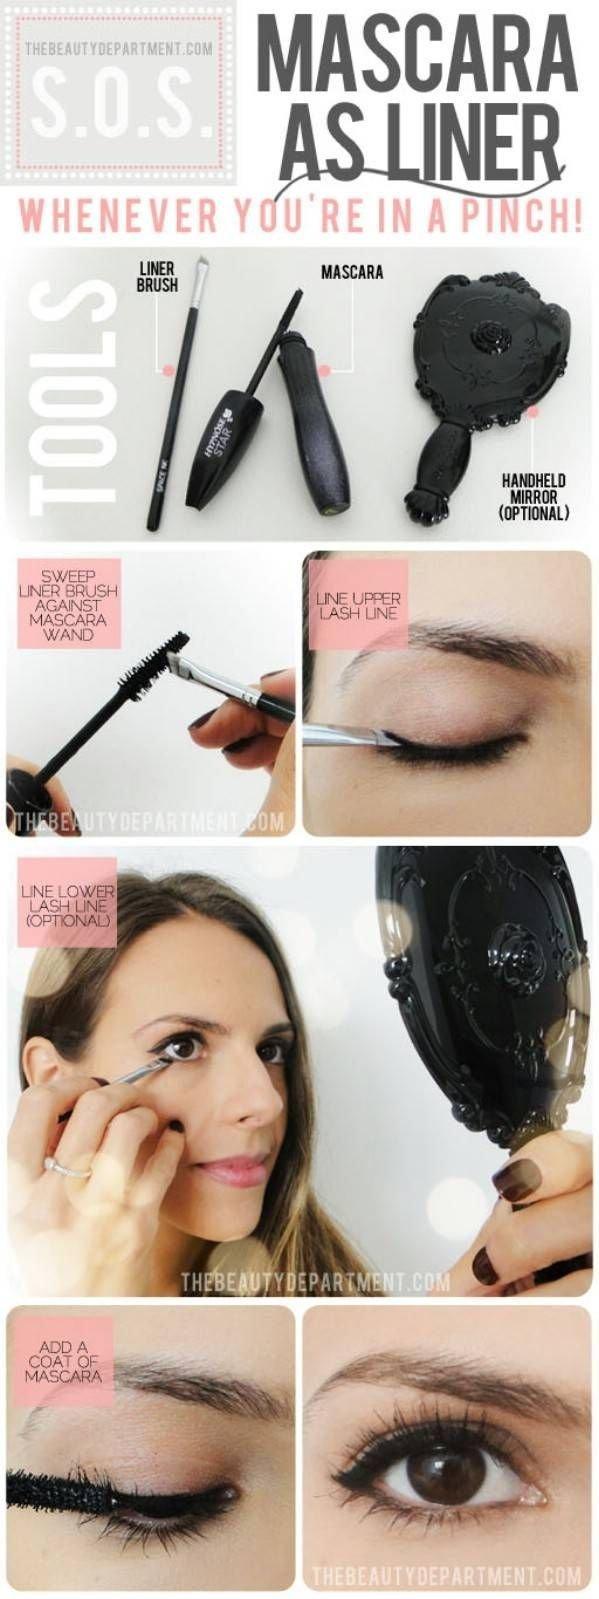 Maccasports,face,nose,head,eyelash,